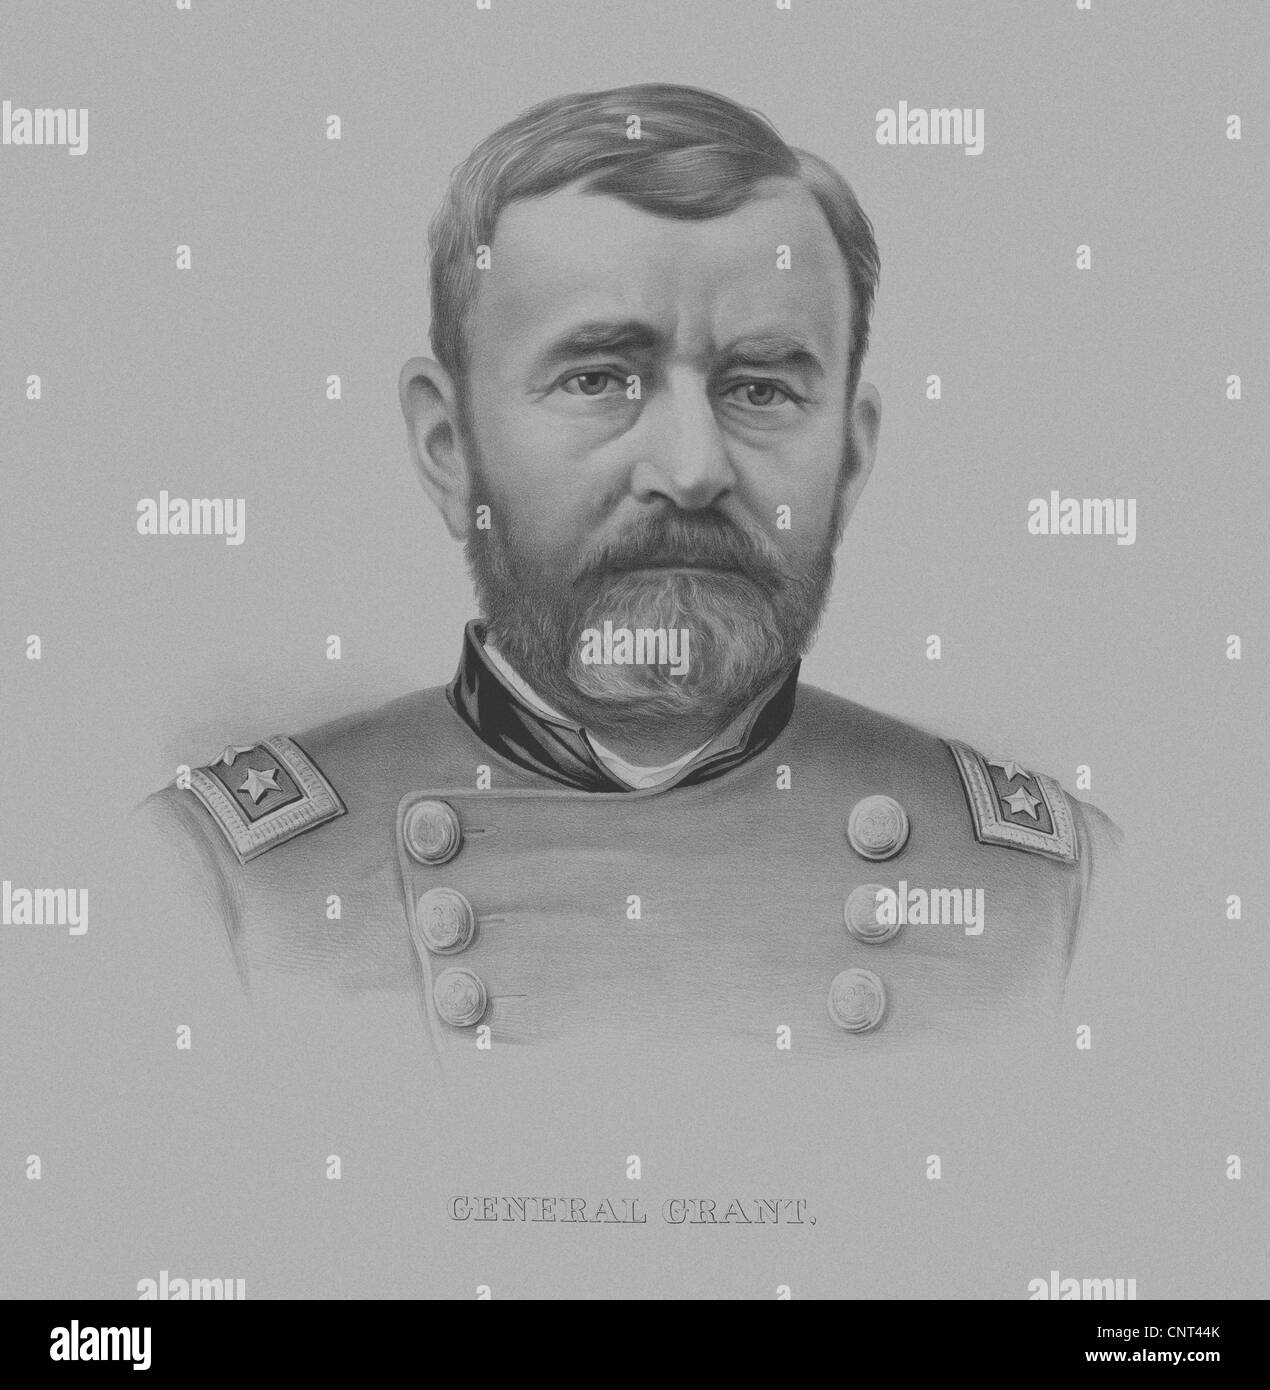 Vintage Guerra Civil Imprimir del General Ulysses S. Grant, vestía uniforme militar. Imagen De Stock